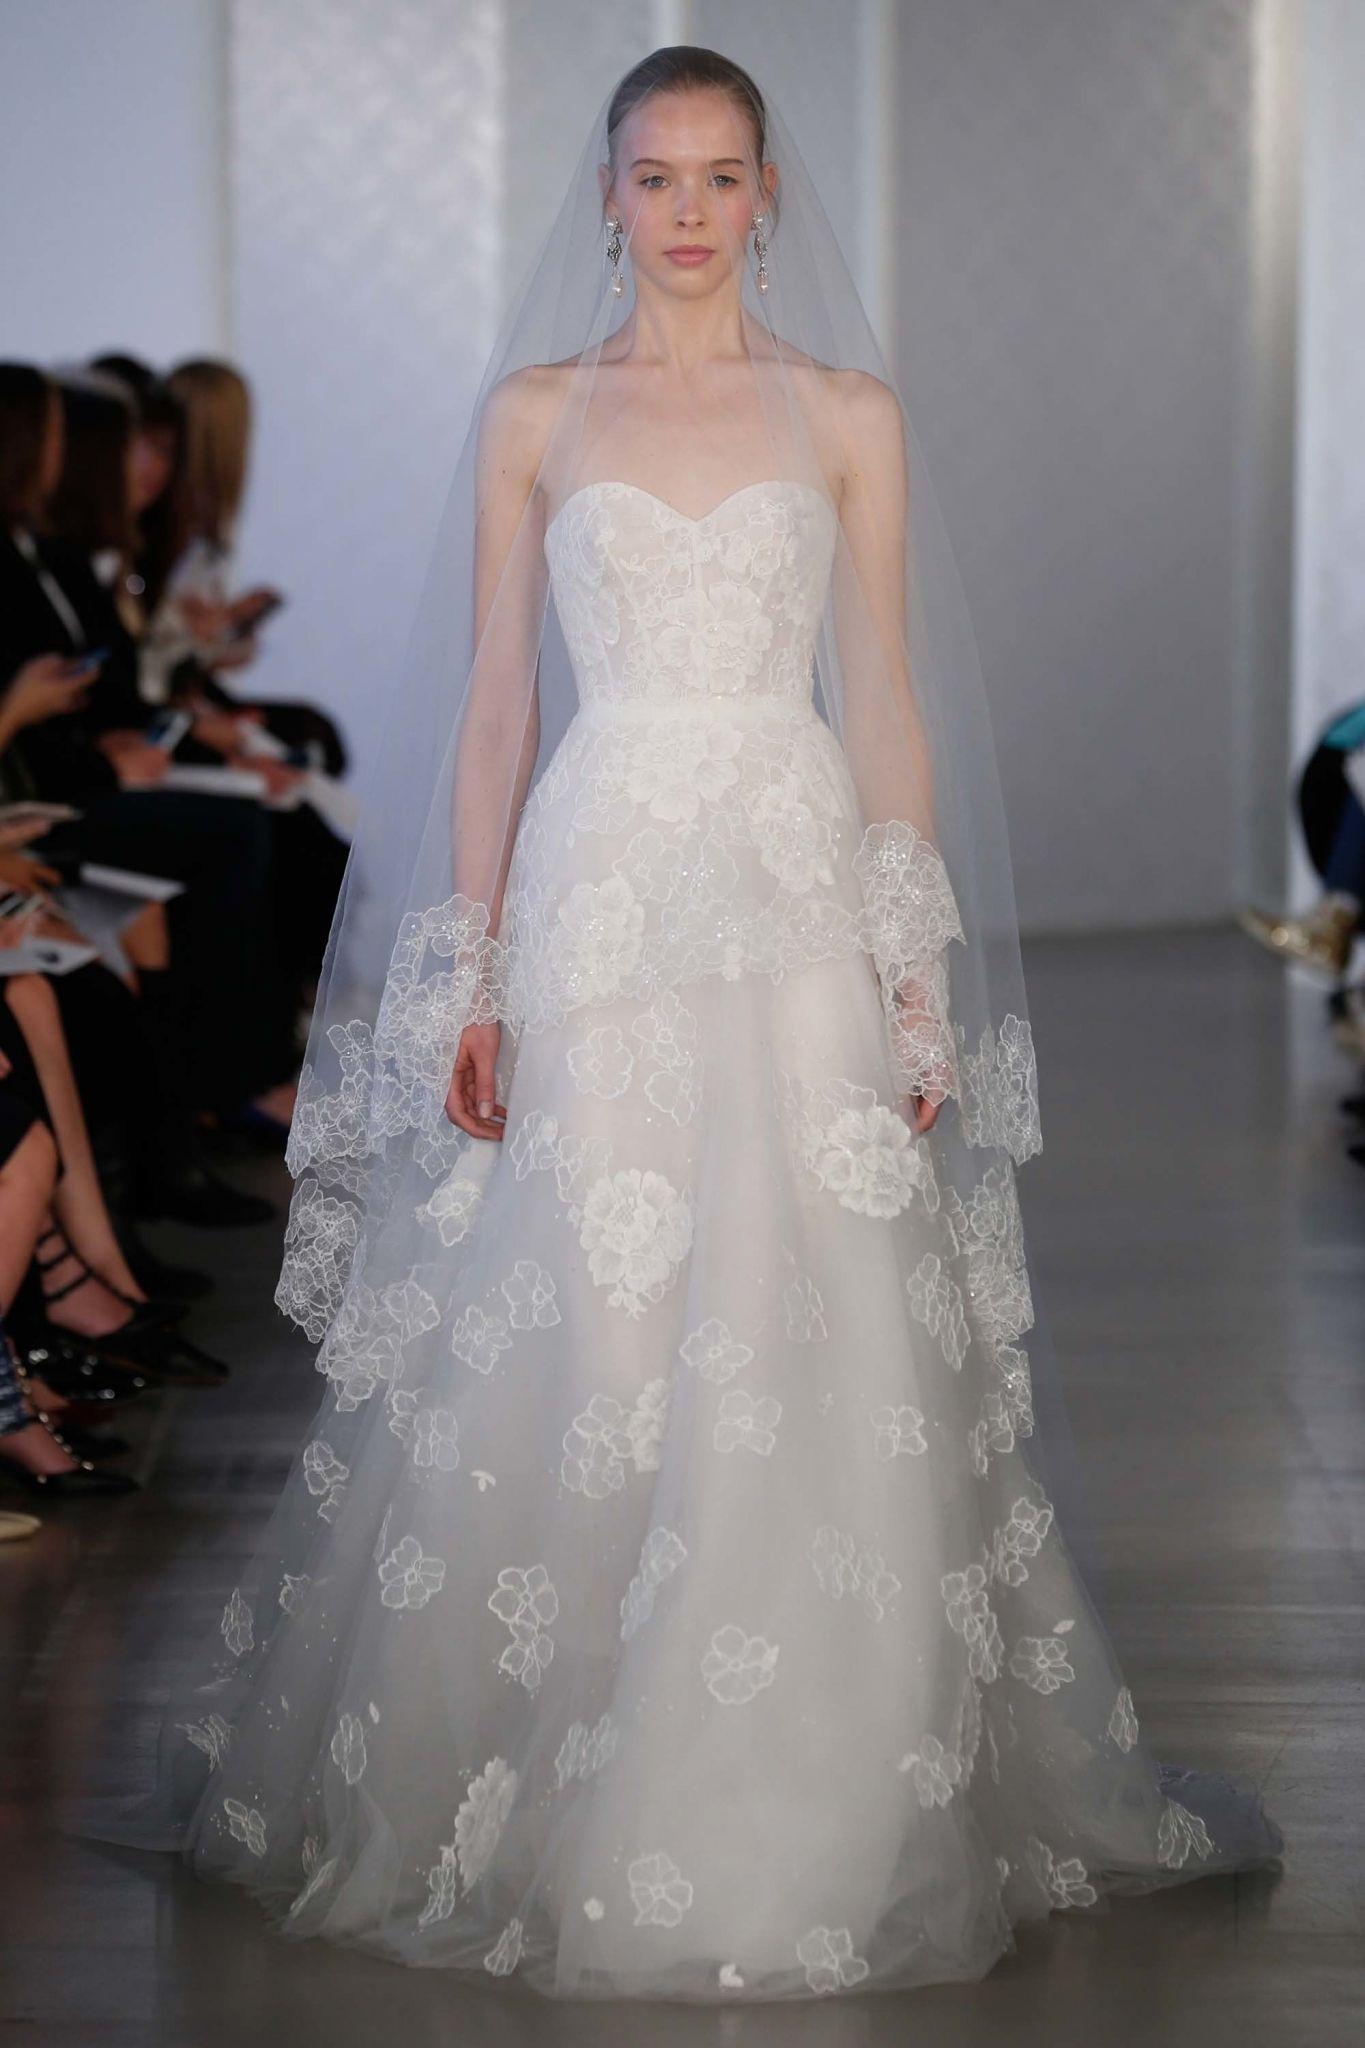 Oscar de la renta wedding dress best dresses for wedding check